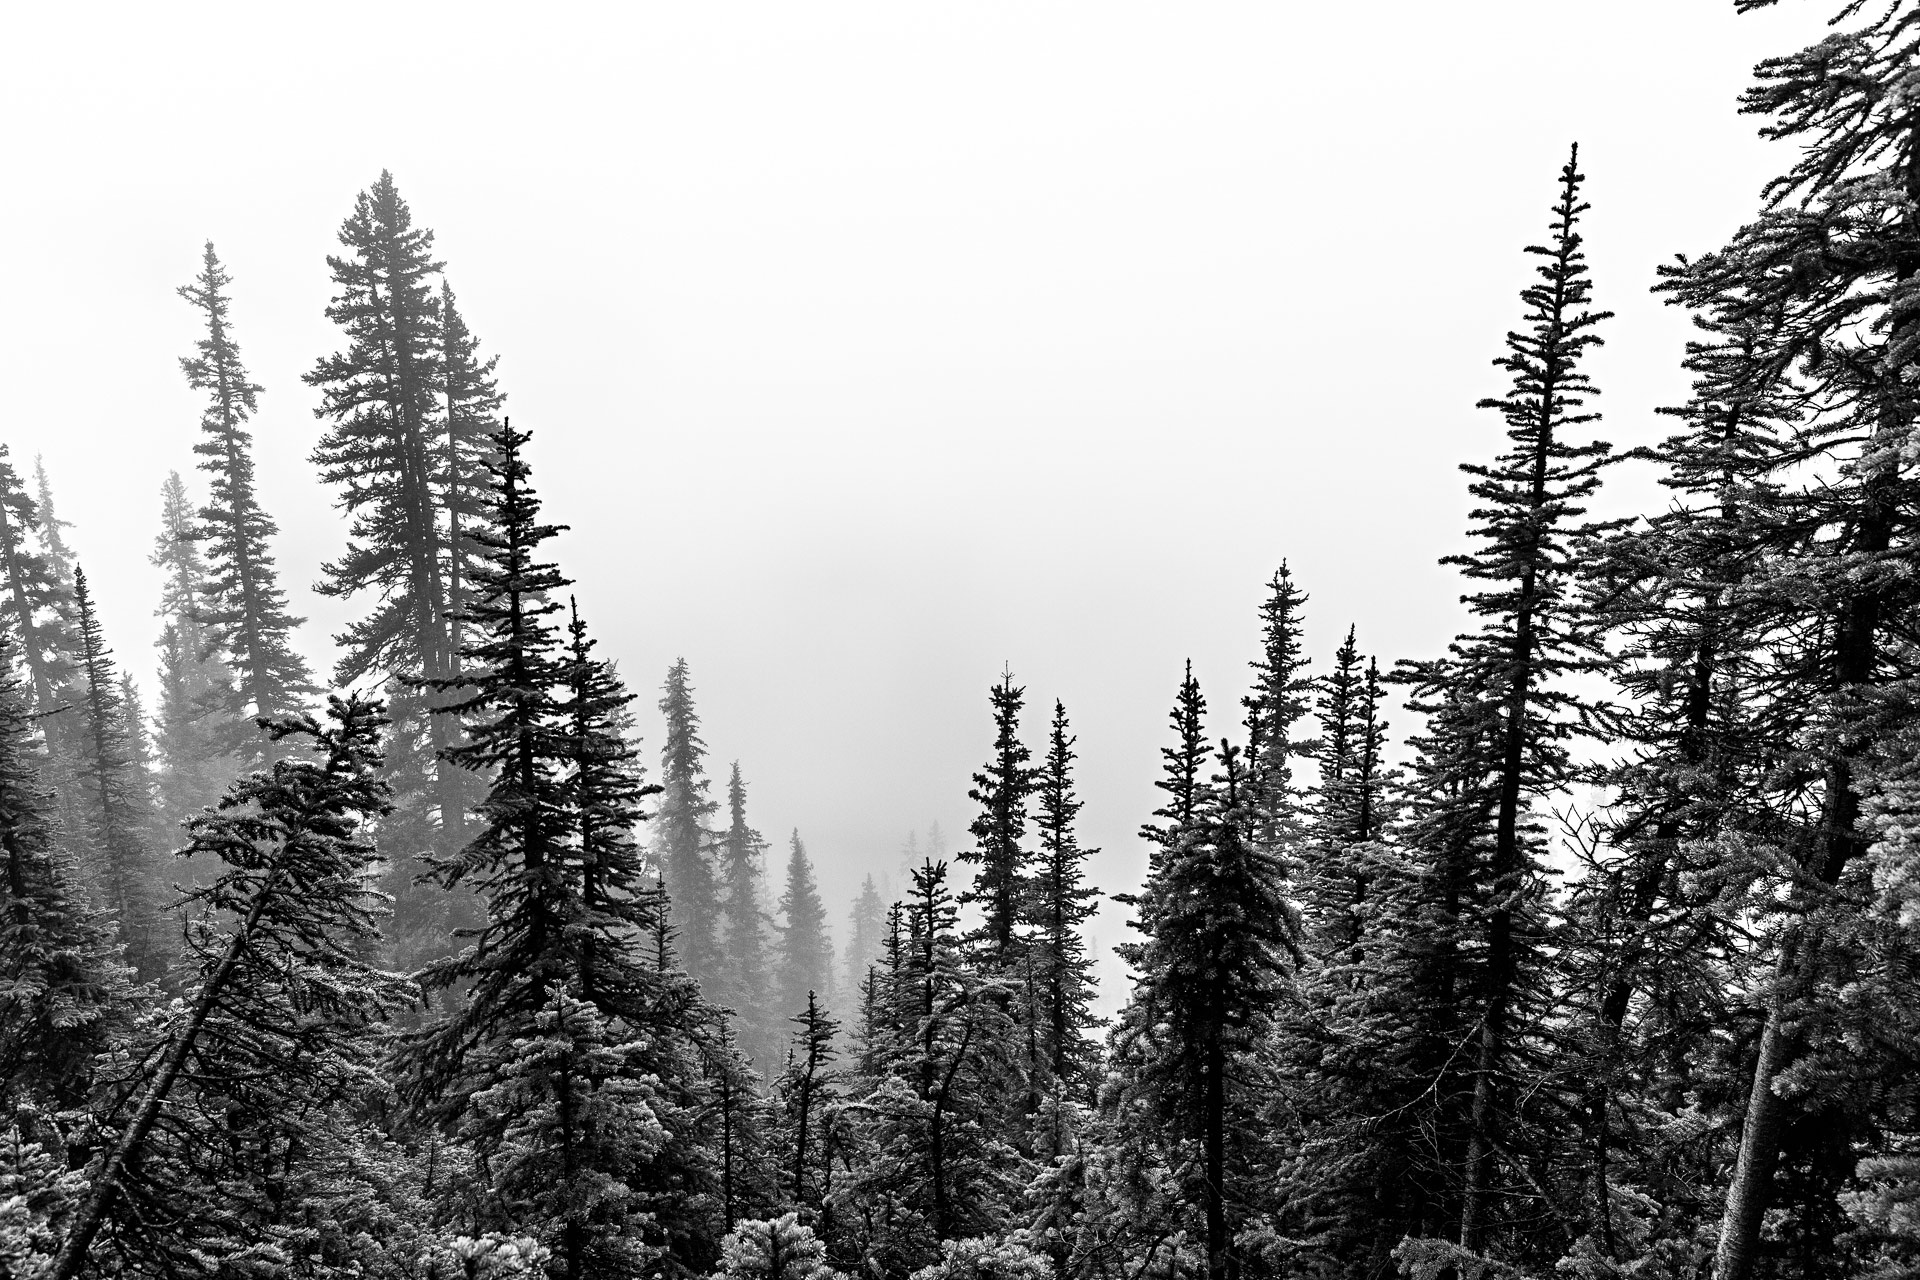 Sapins parc national de Banff Canada